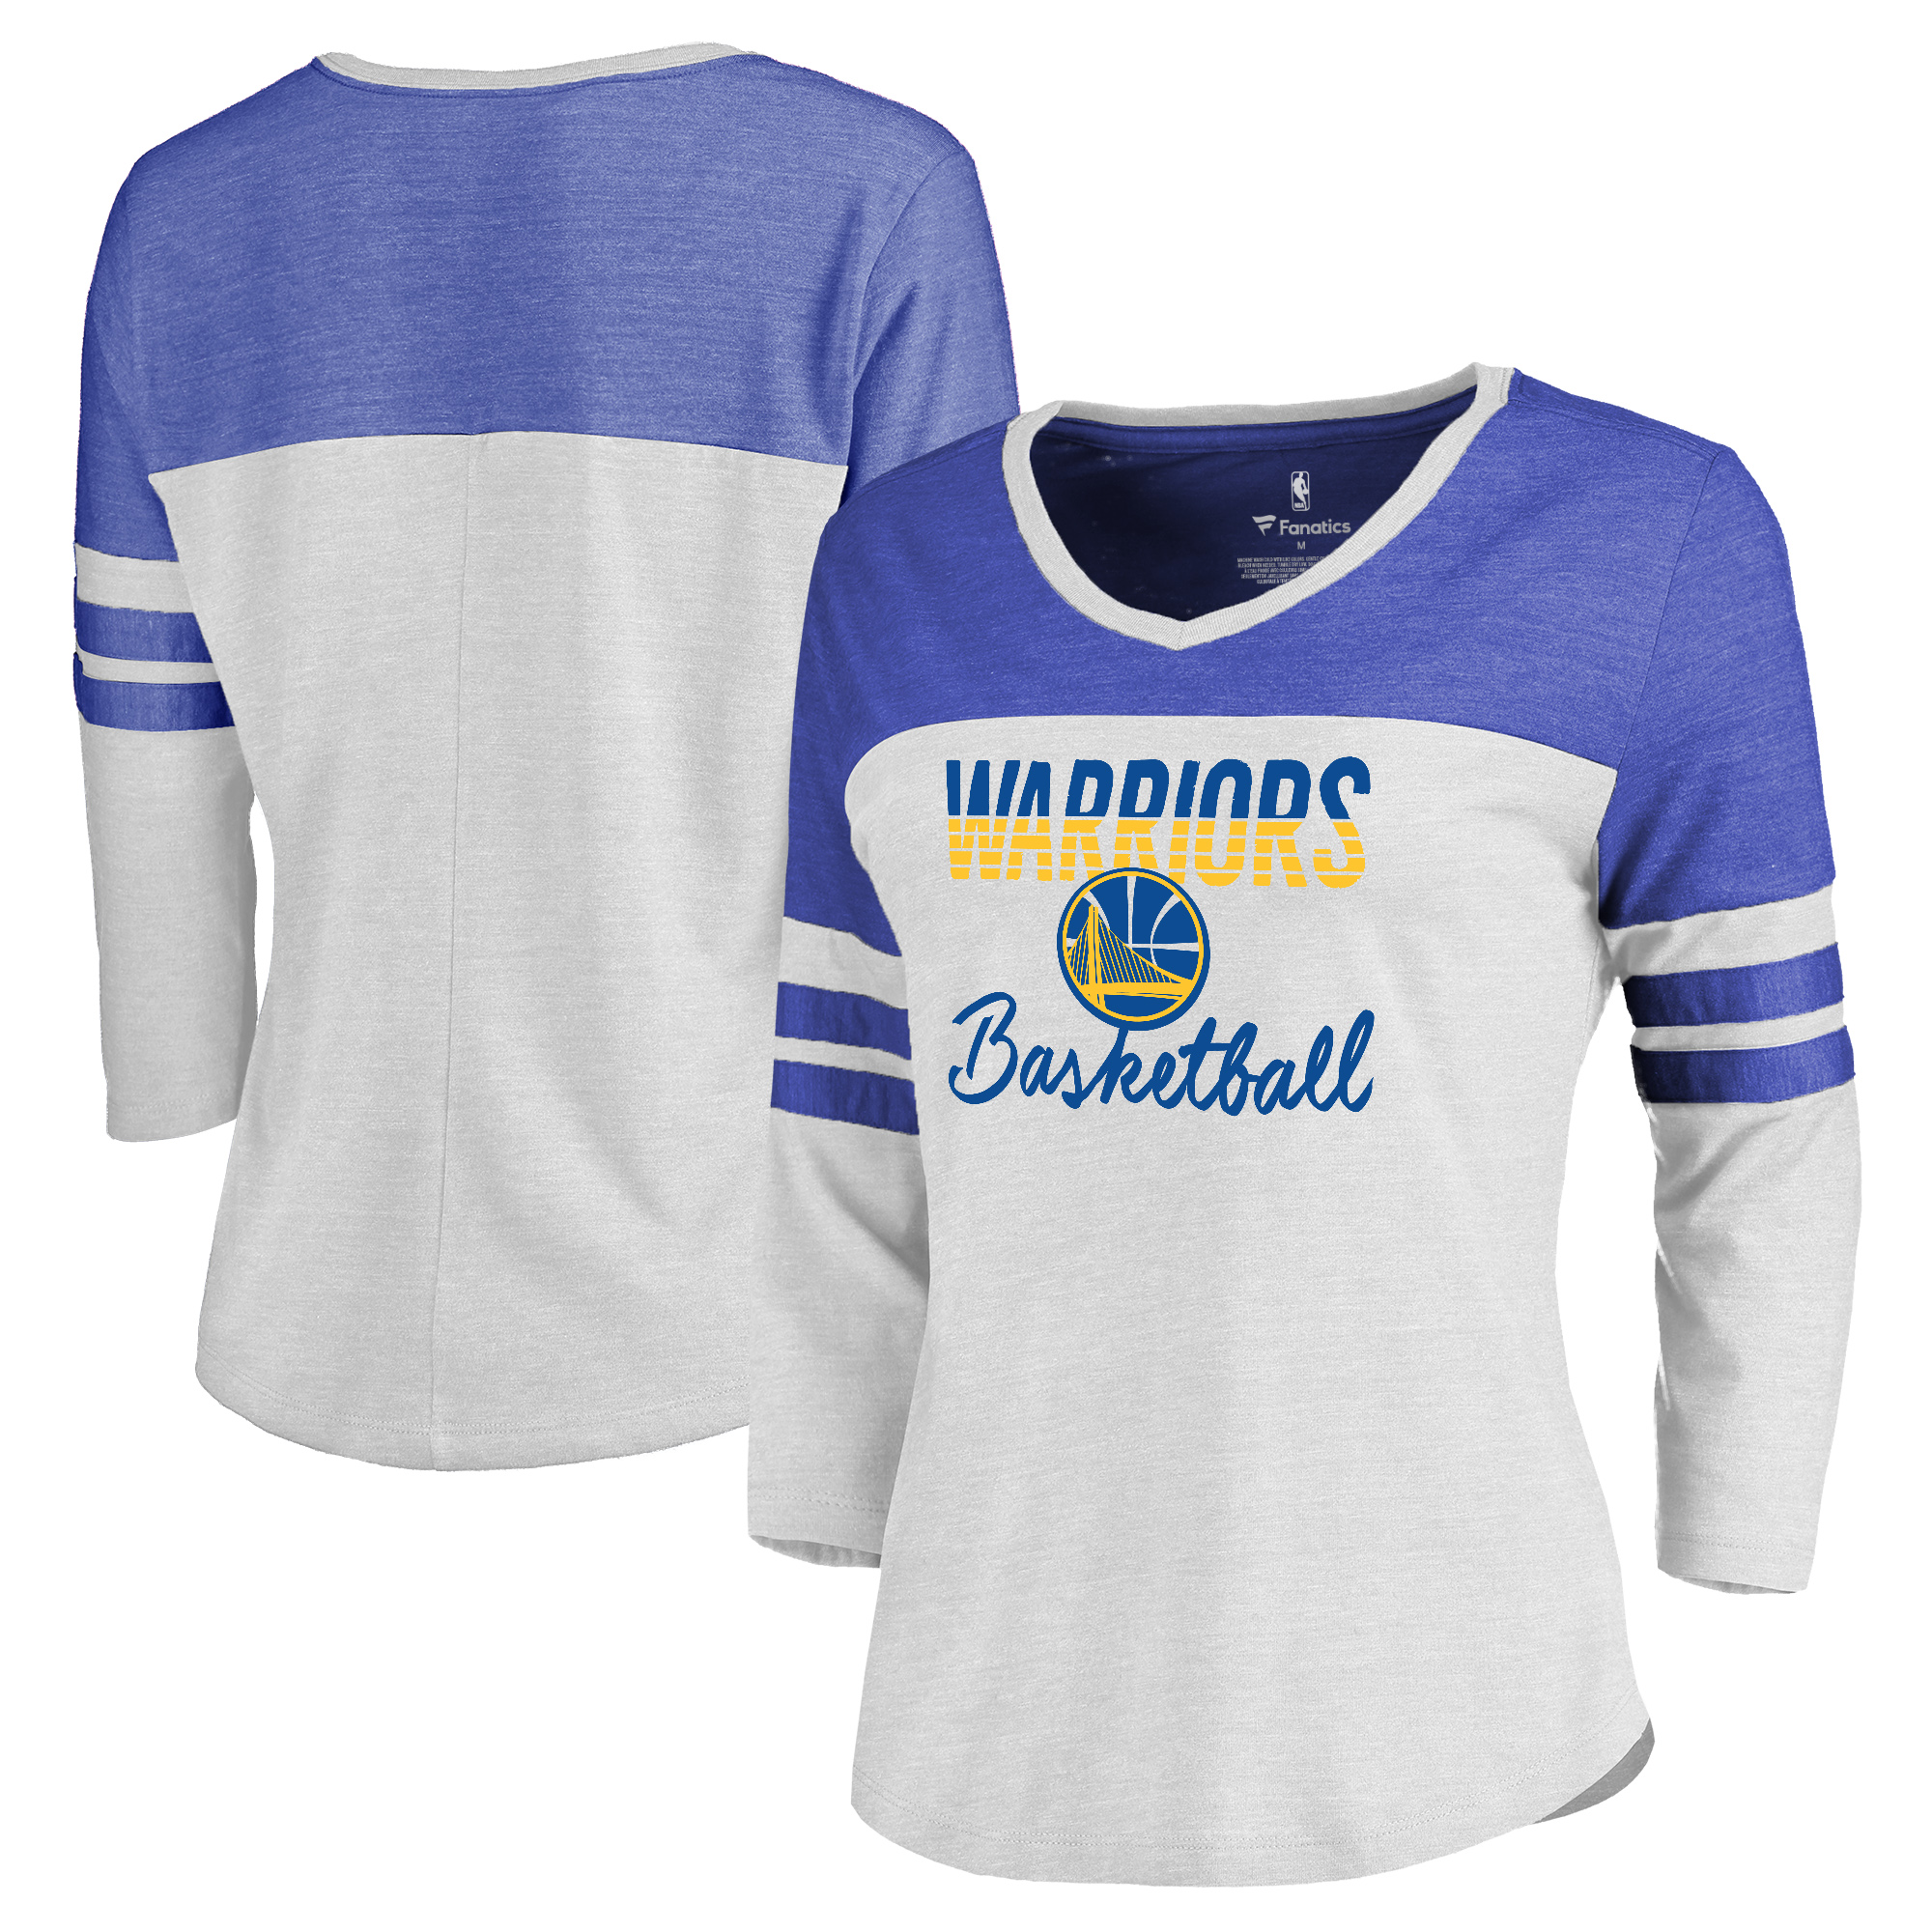 Golden State Warriors Fanatics Branded Women's Plus Size Free Line Color Block 3/4-Sleeve Tri-Blend T-Shirt - White/Royal